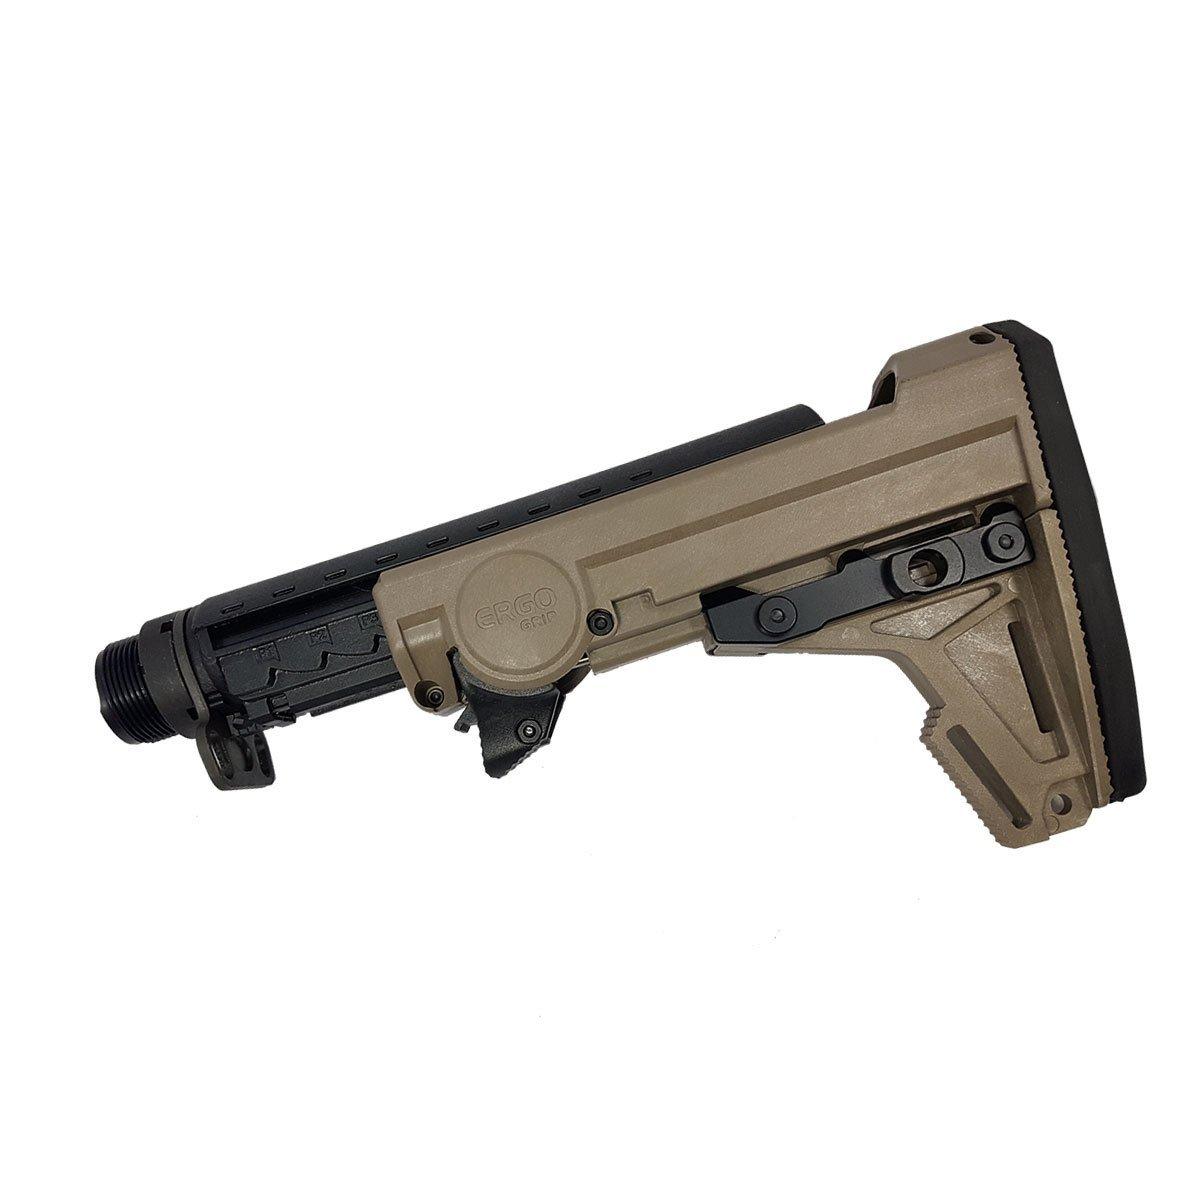 Ergo Grip F93 Pro Collapsible Stock Kit FDE